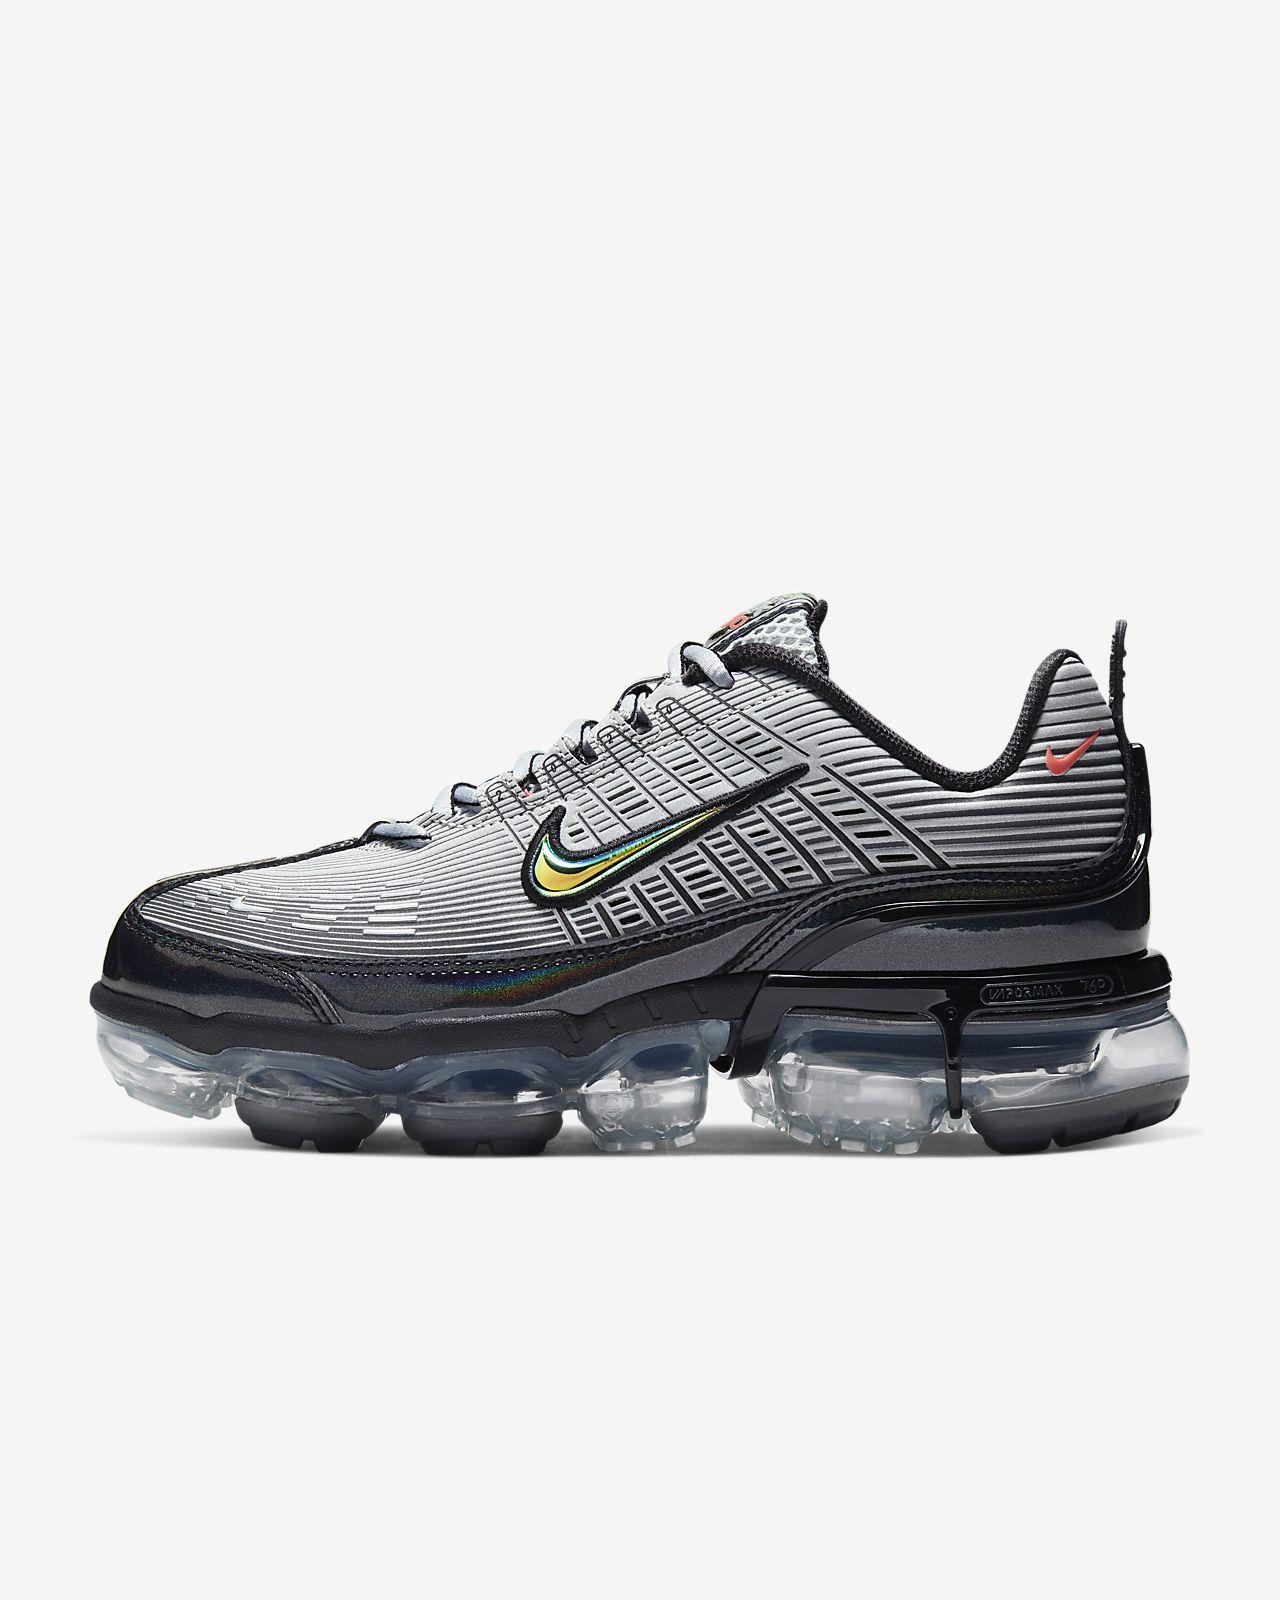 Nike air, Nike air vapormax, Nike shoes